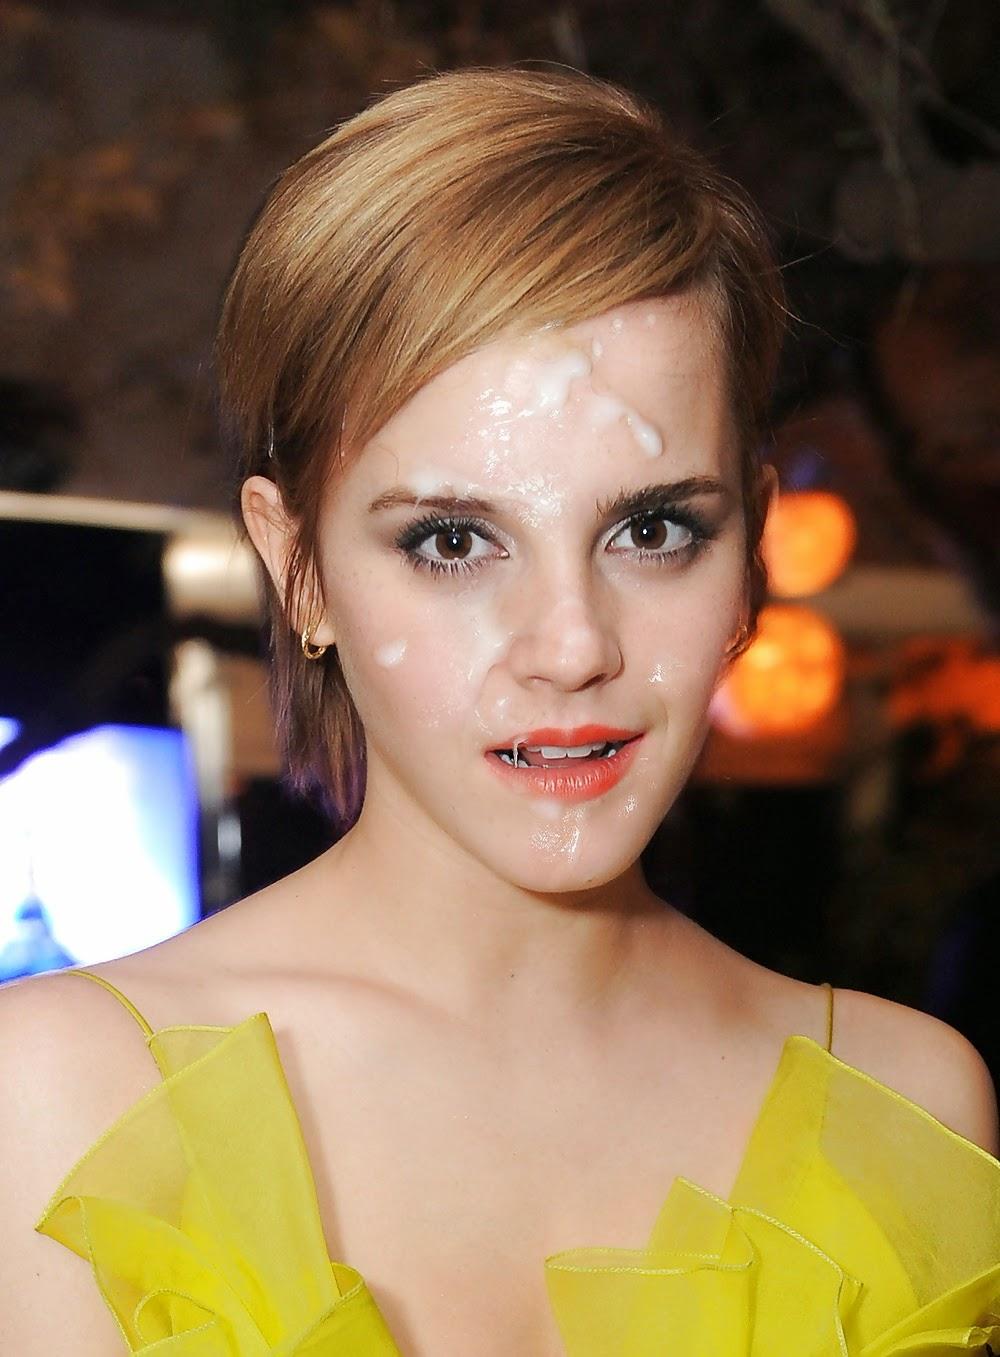 PandaFakes: Emma Watson Facial